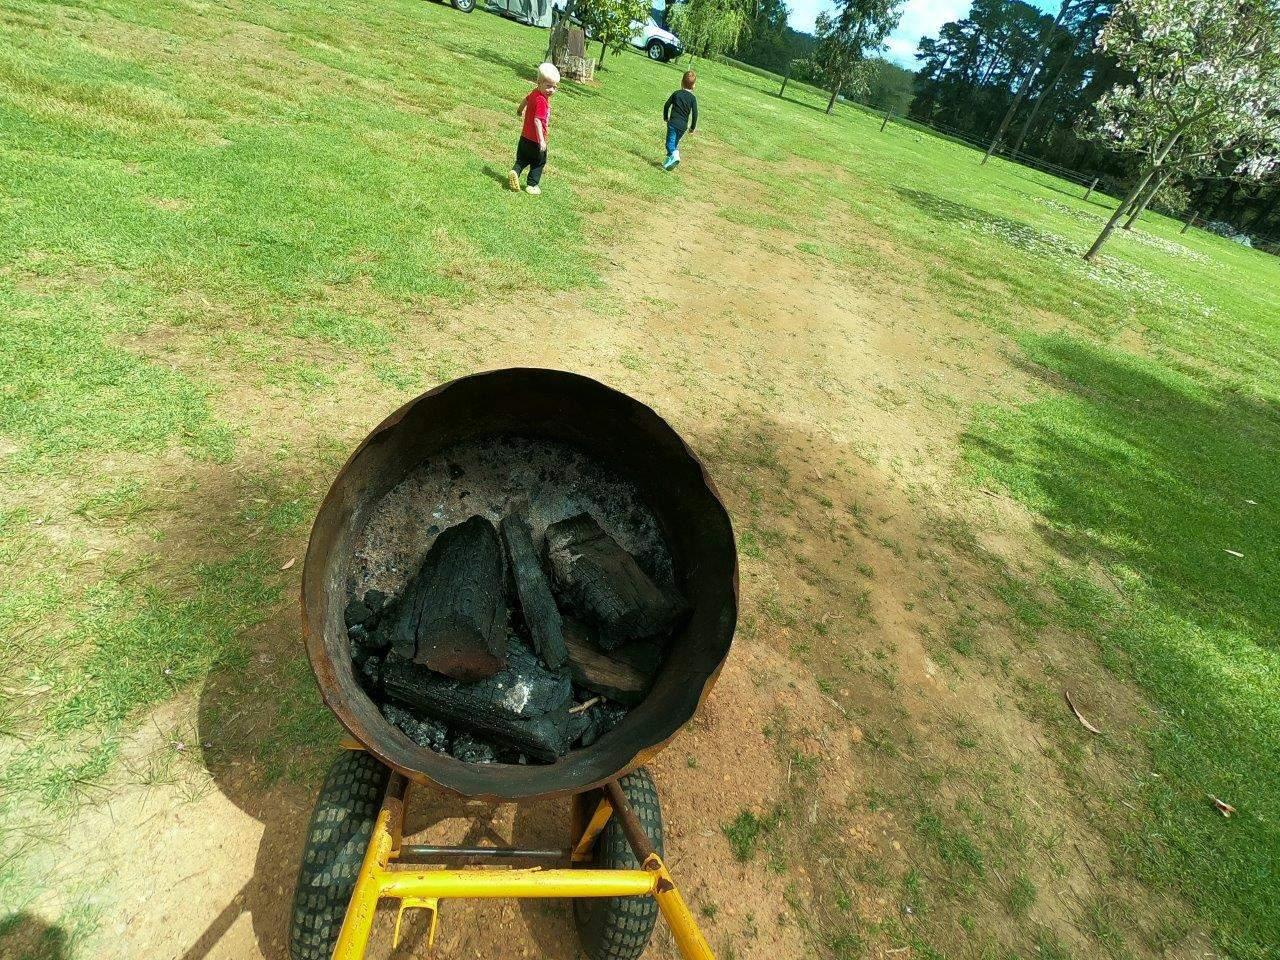 Fire pit at Fonty's